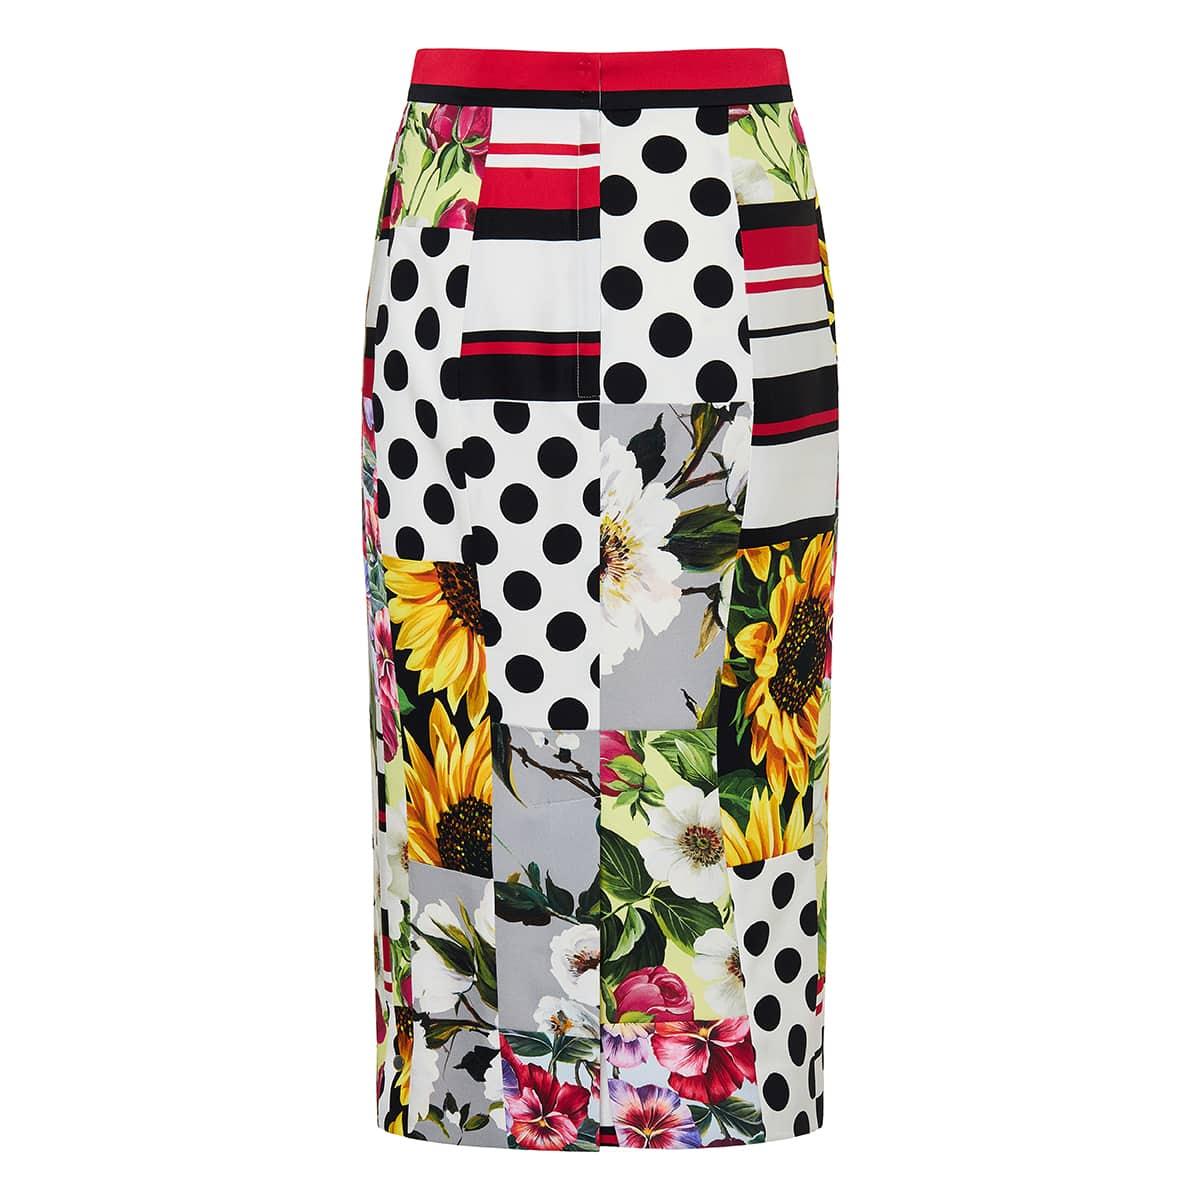 Patchwork-print pencil skirt